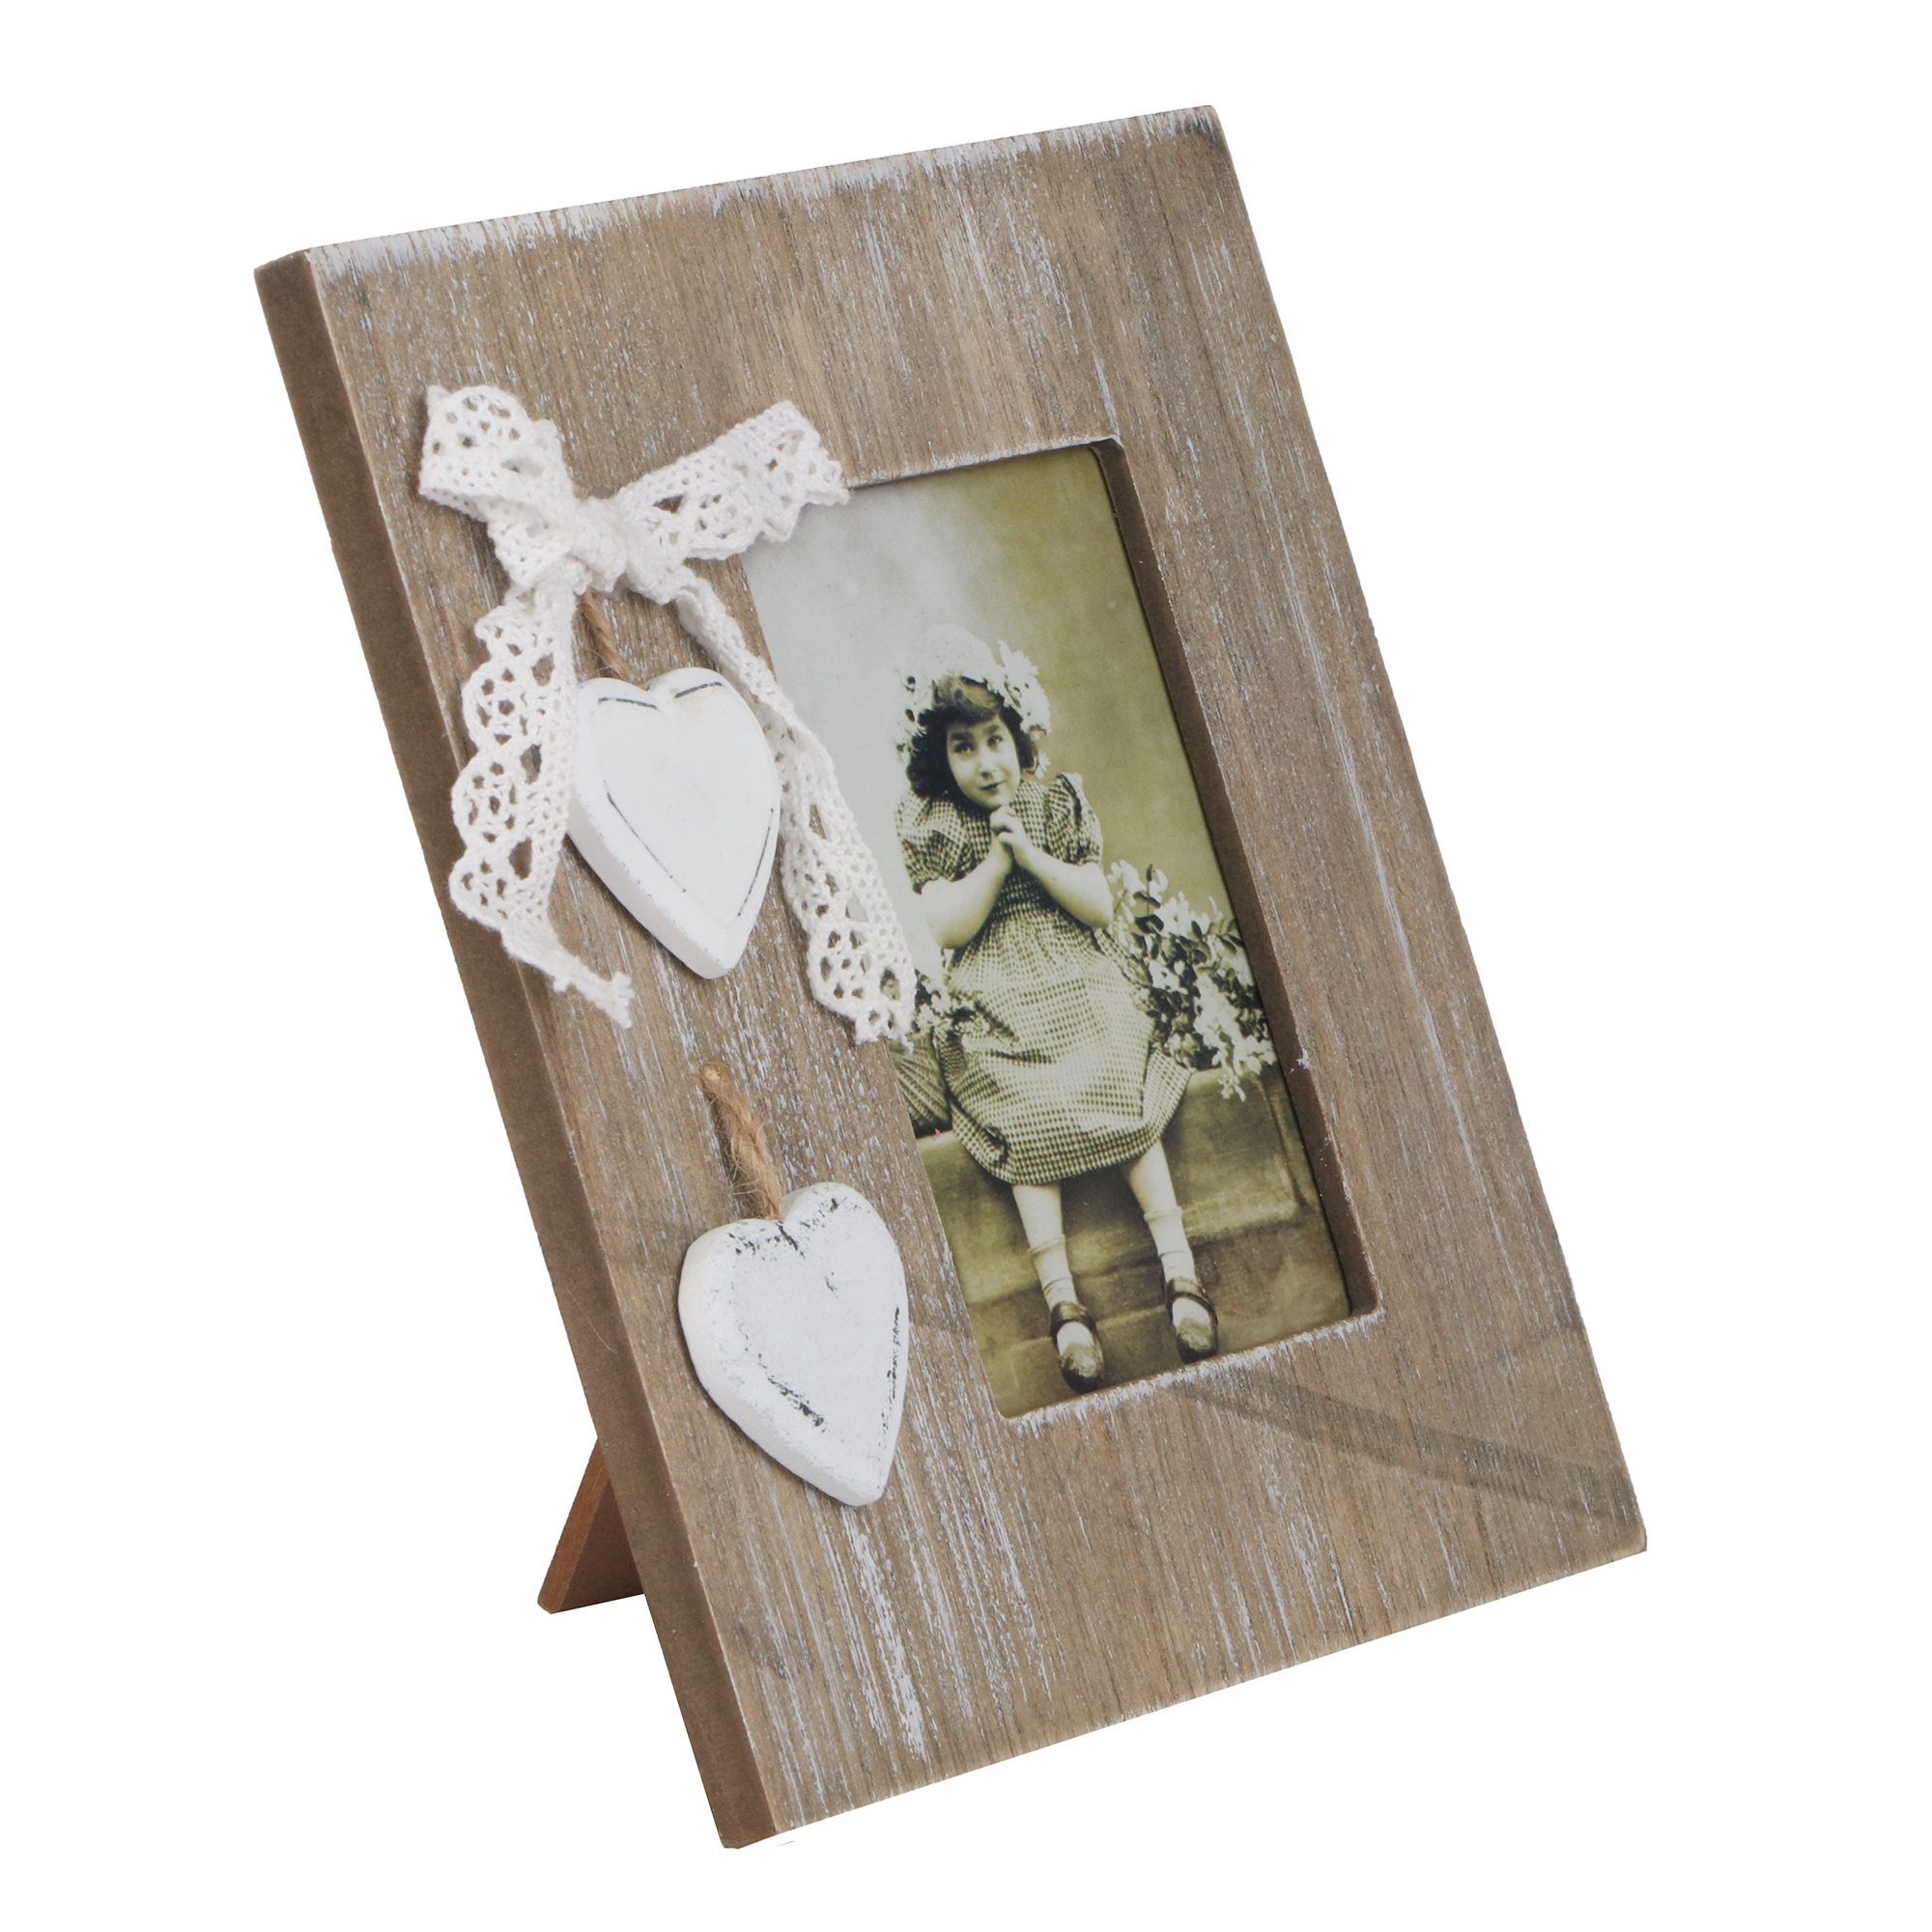 Рамка для фото декоративная Dekor pap деревянная 18х20см рамка для фото arte fiorentino